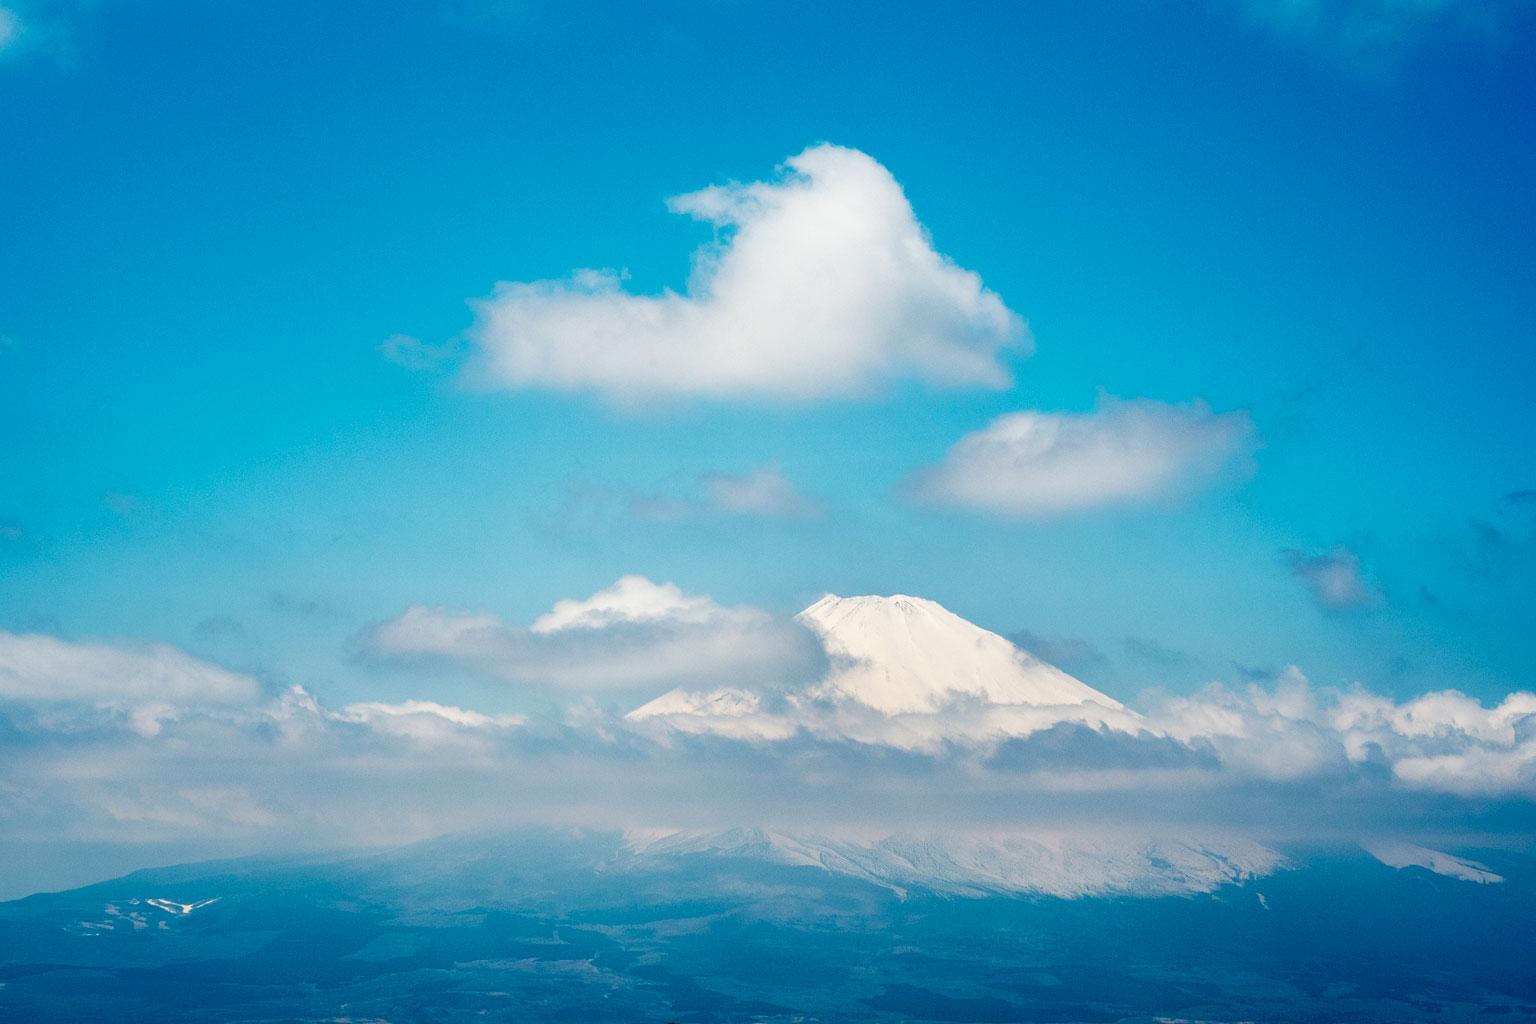 120408_PR_Japan_04_F09492.jpg